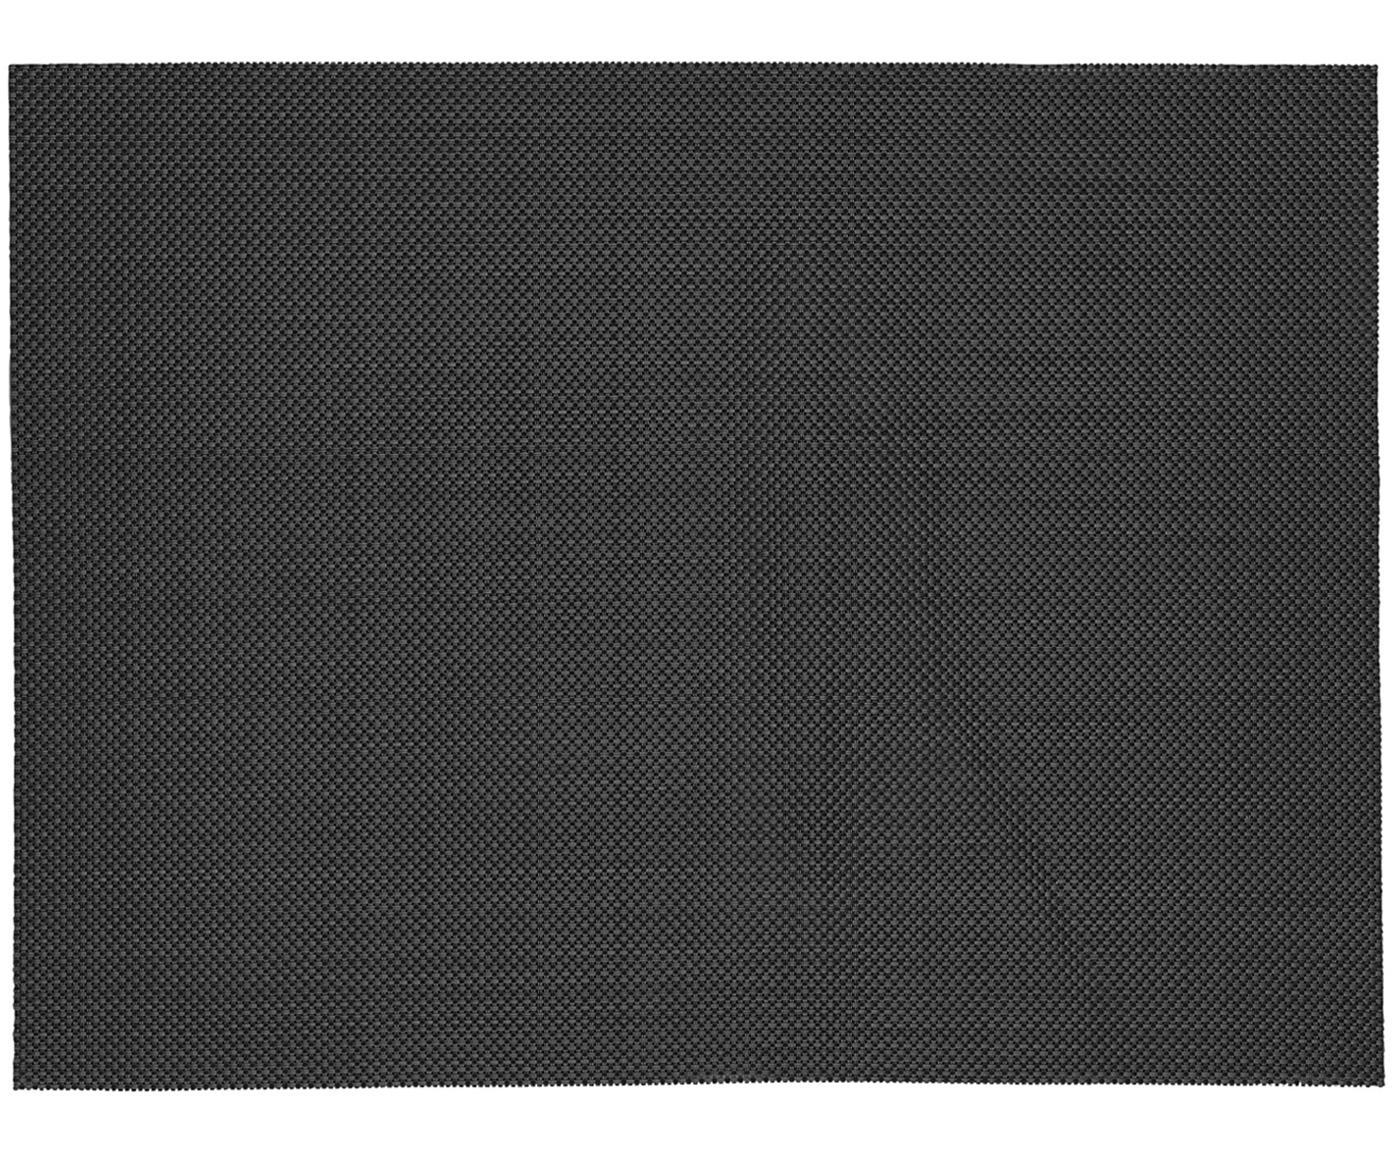 Placemats Mabra, 2 stuks, Kunststof (PVC), Zwart, 30 x 40 cm